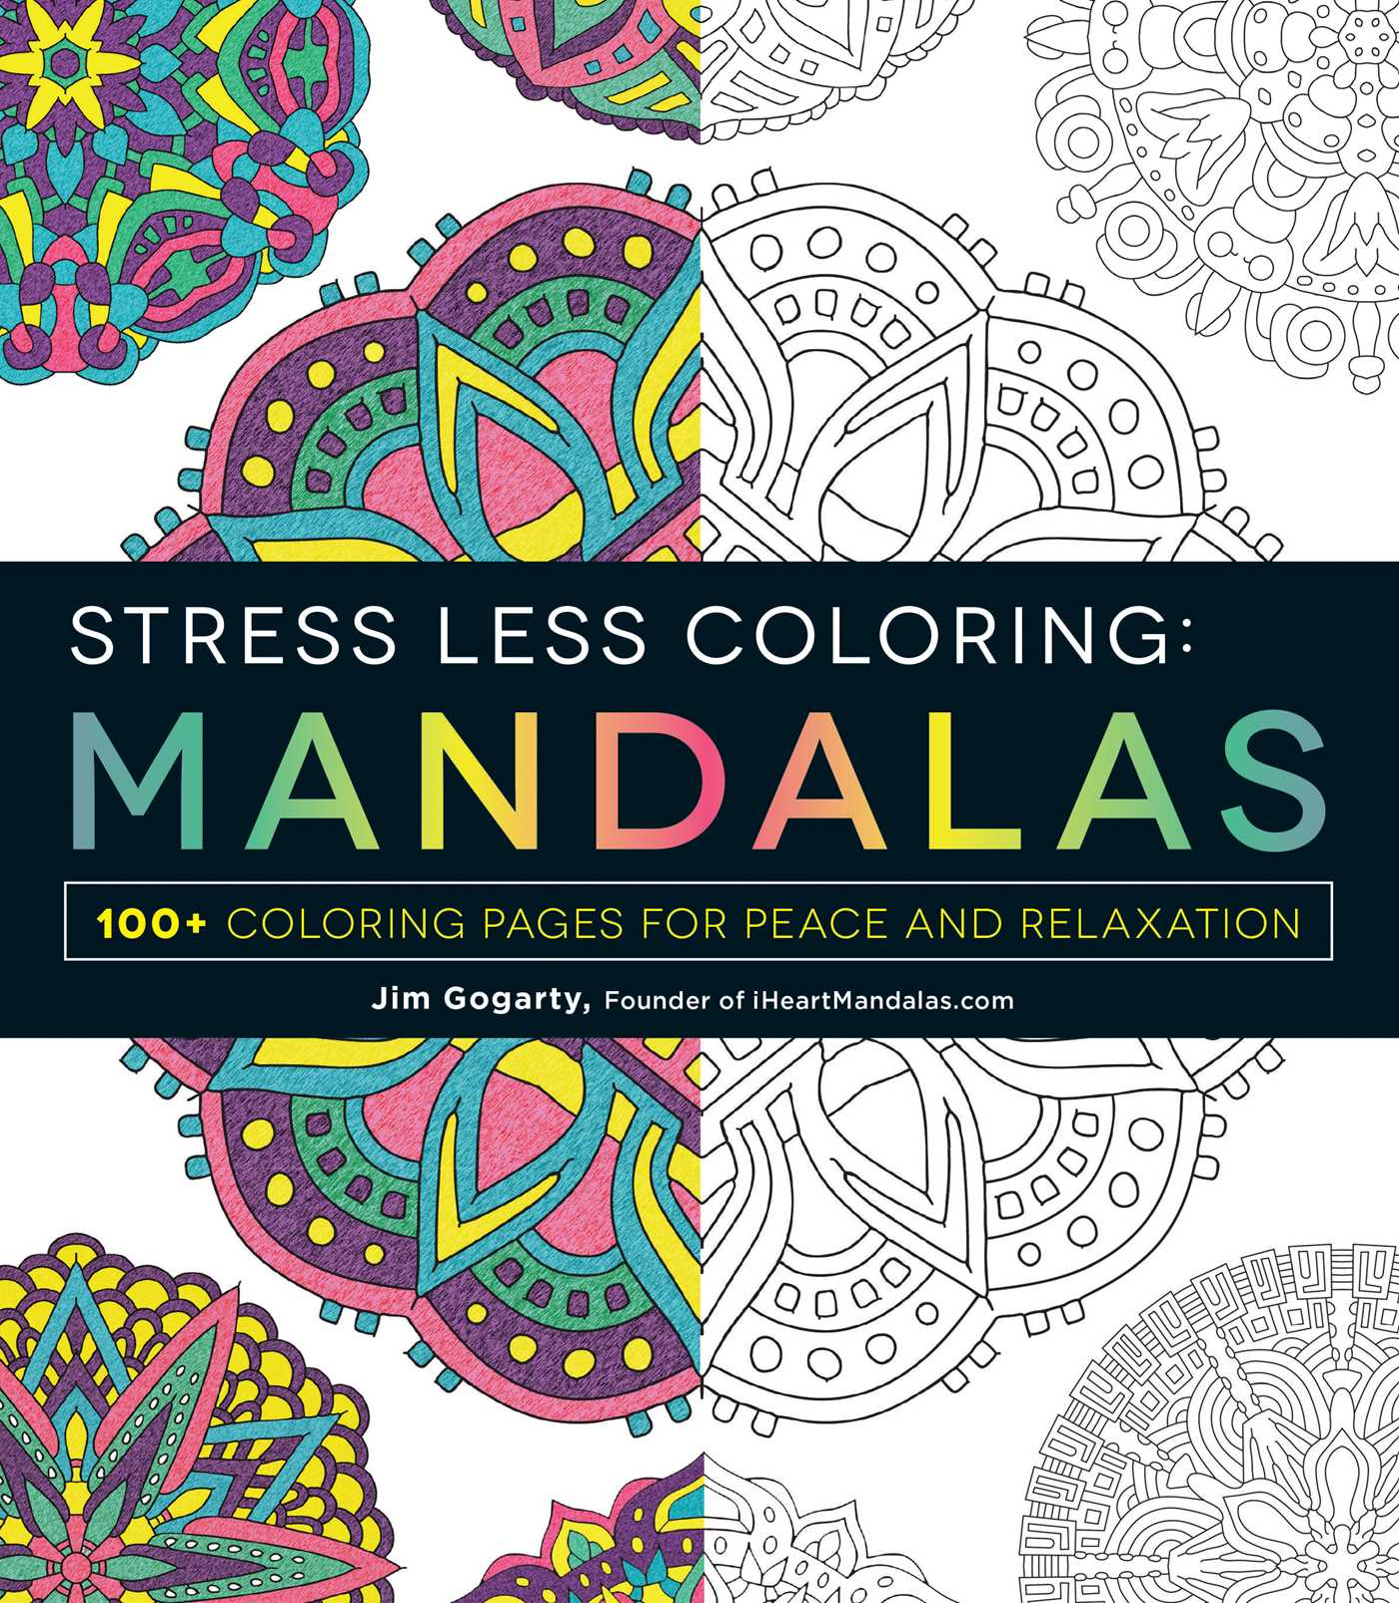 Stress Less Coloring Mandalas 9781440592881 Hr